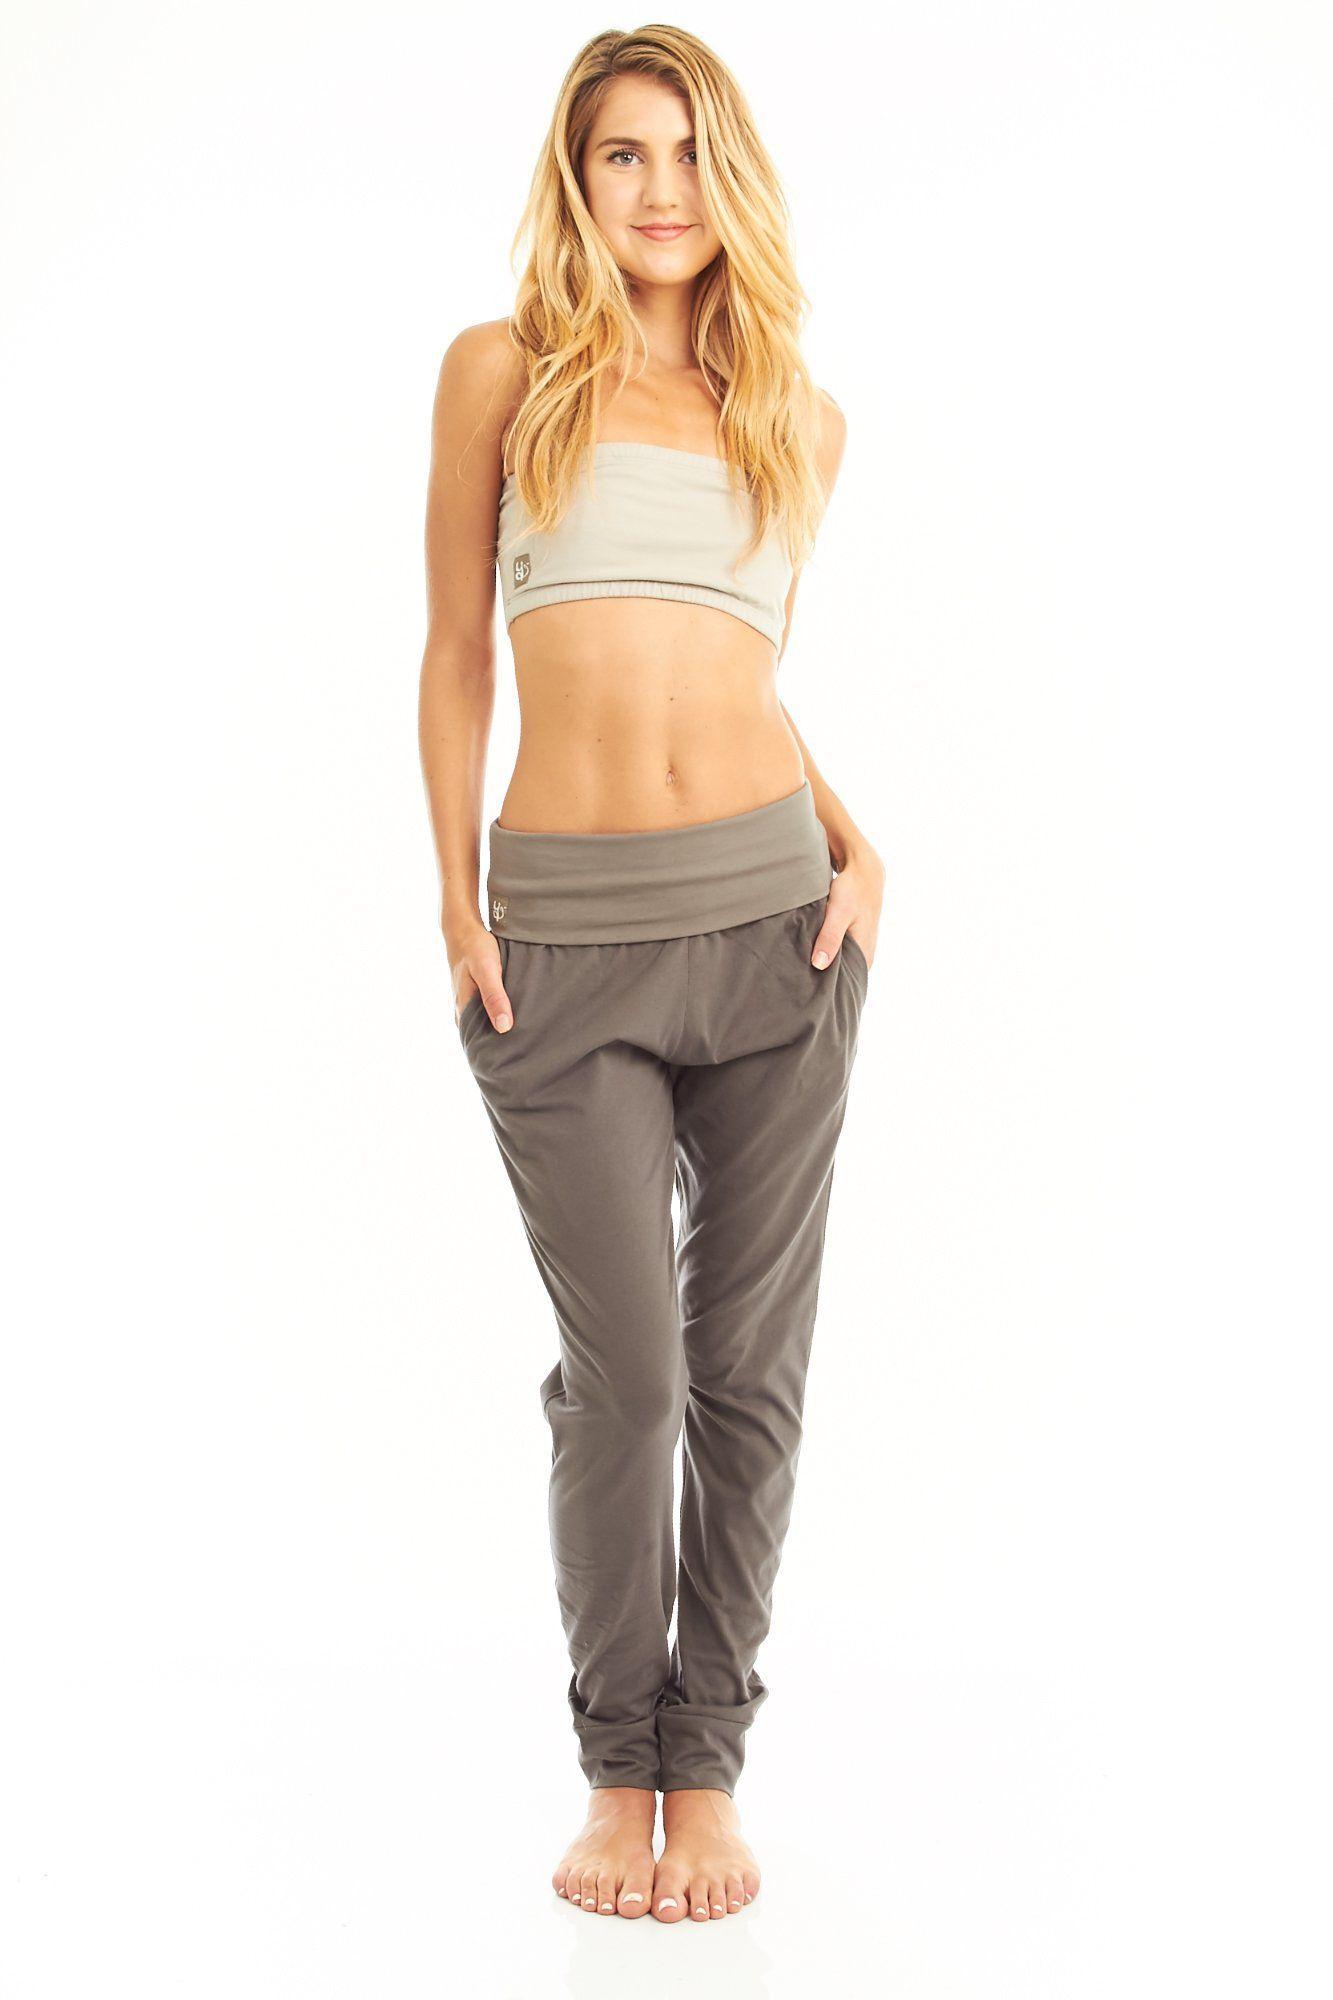 'Astau' Strapless Yoga Bra